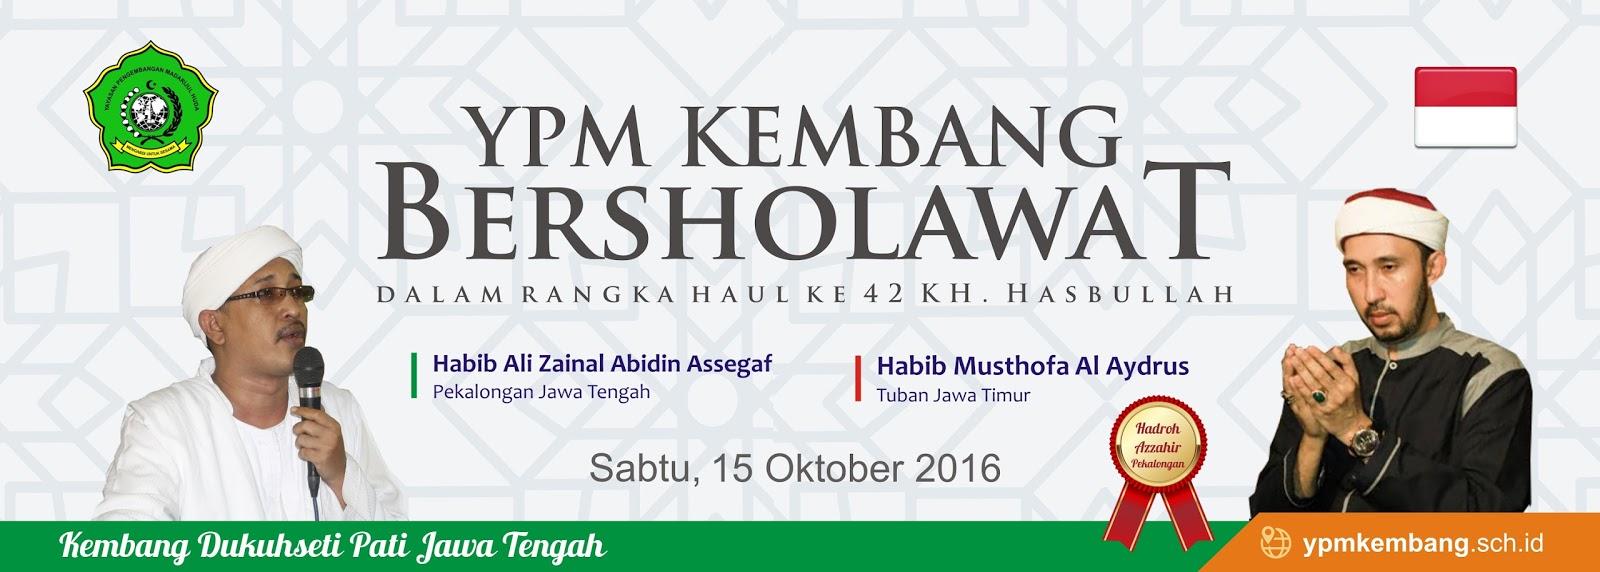 Contoh Desain Background Panggung Sholawat Cdr Terbaru Om Salim